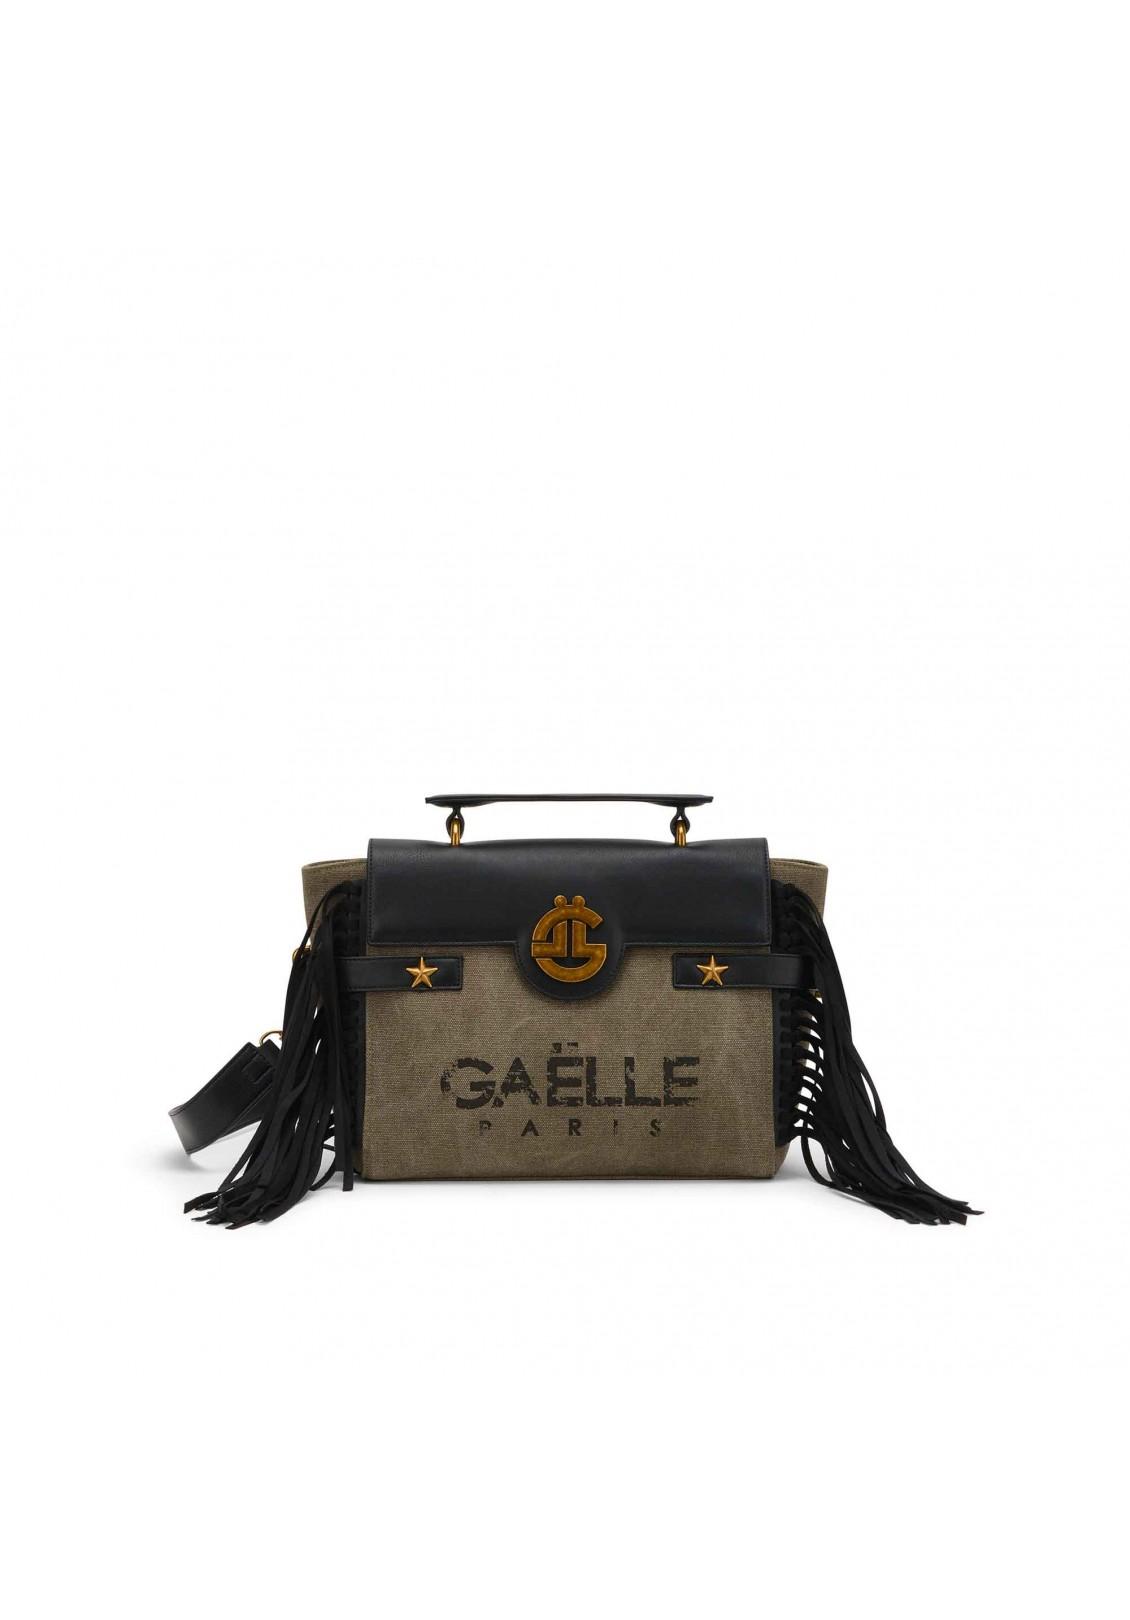 SHOULDER BAG - GBDA1920 - GAELLE PARIS